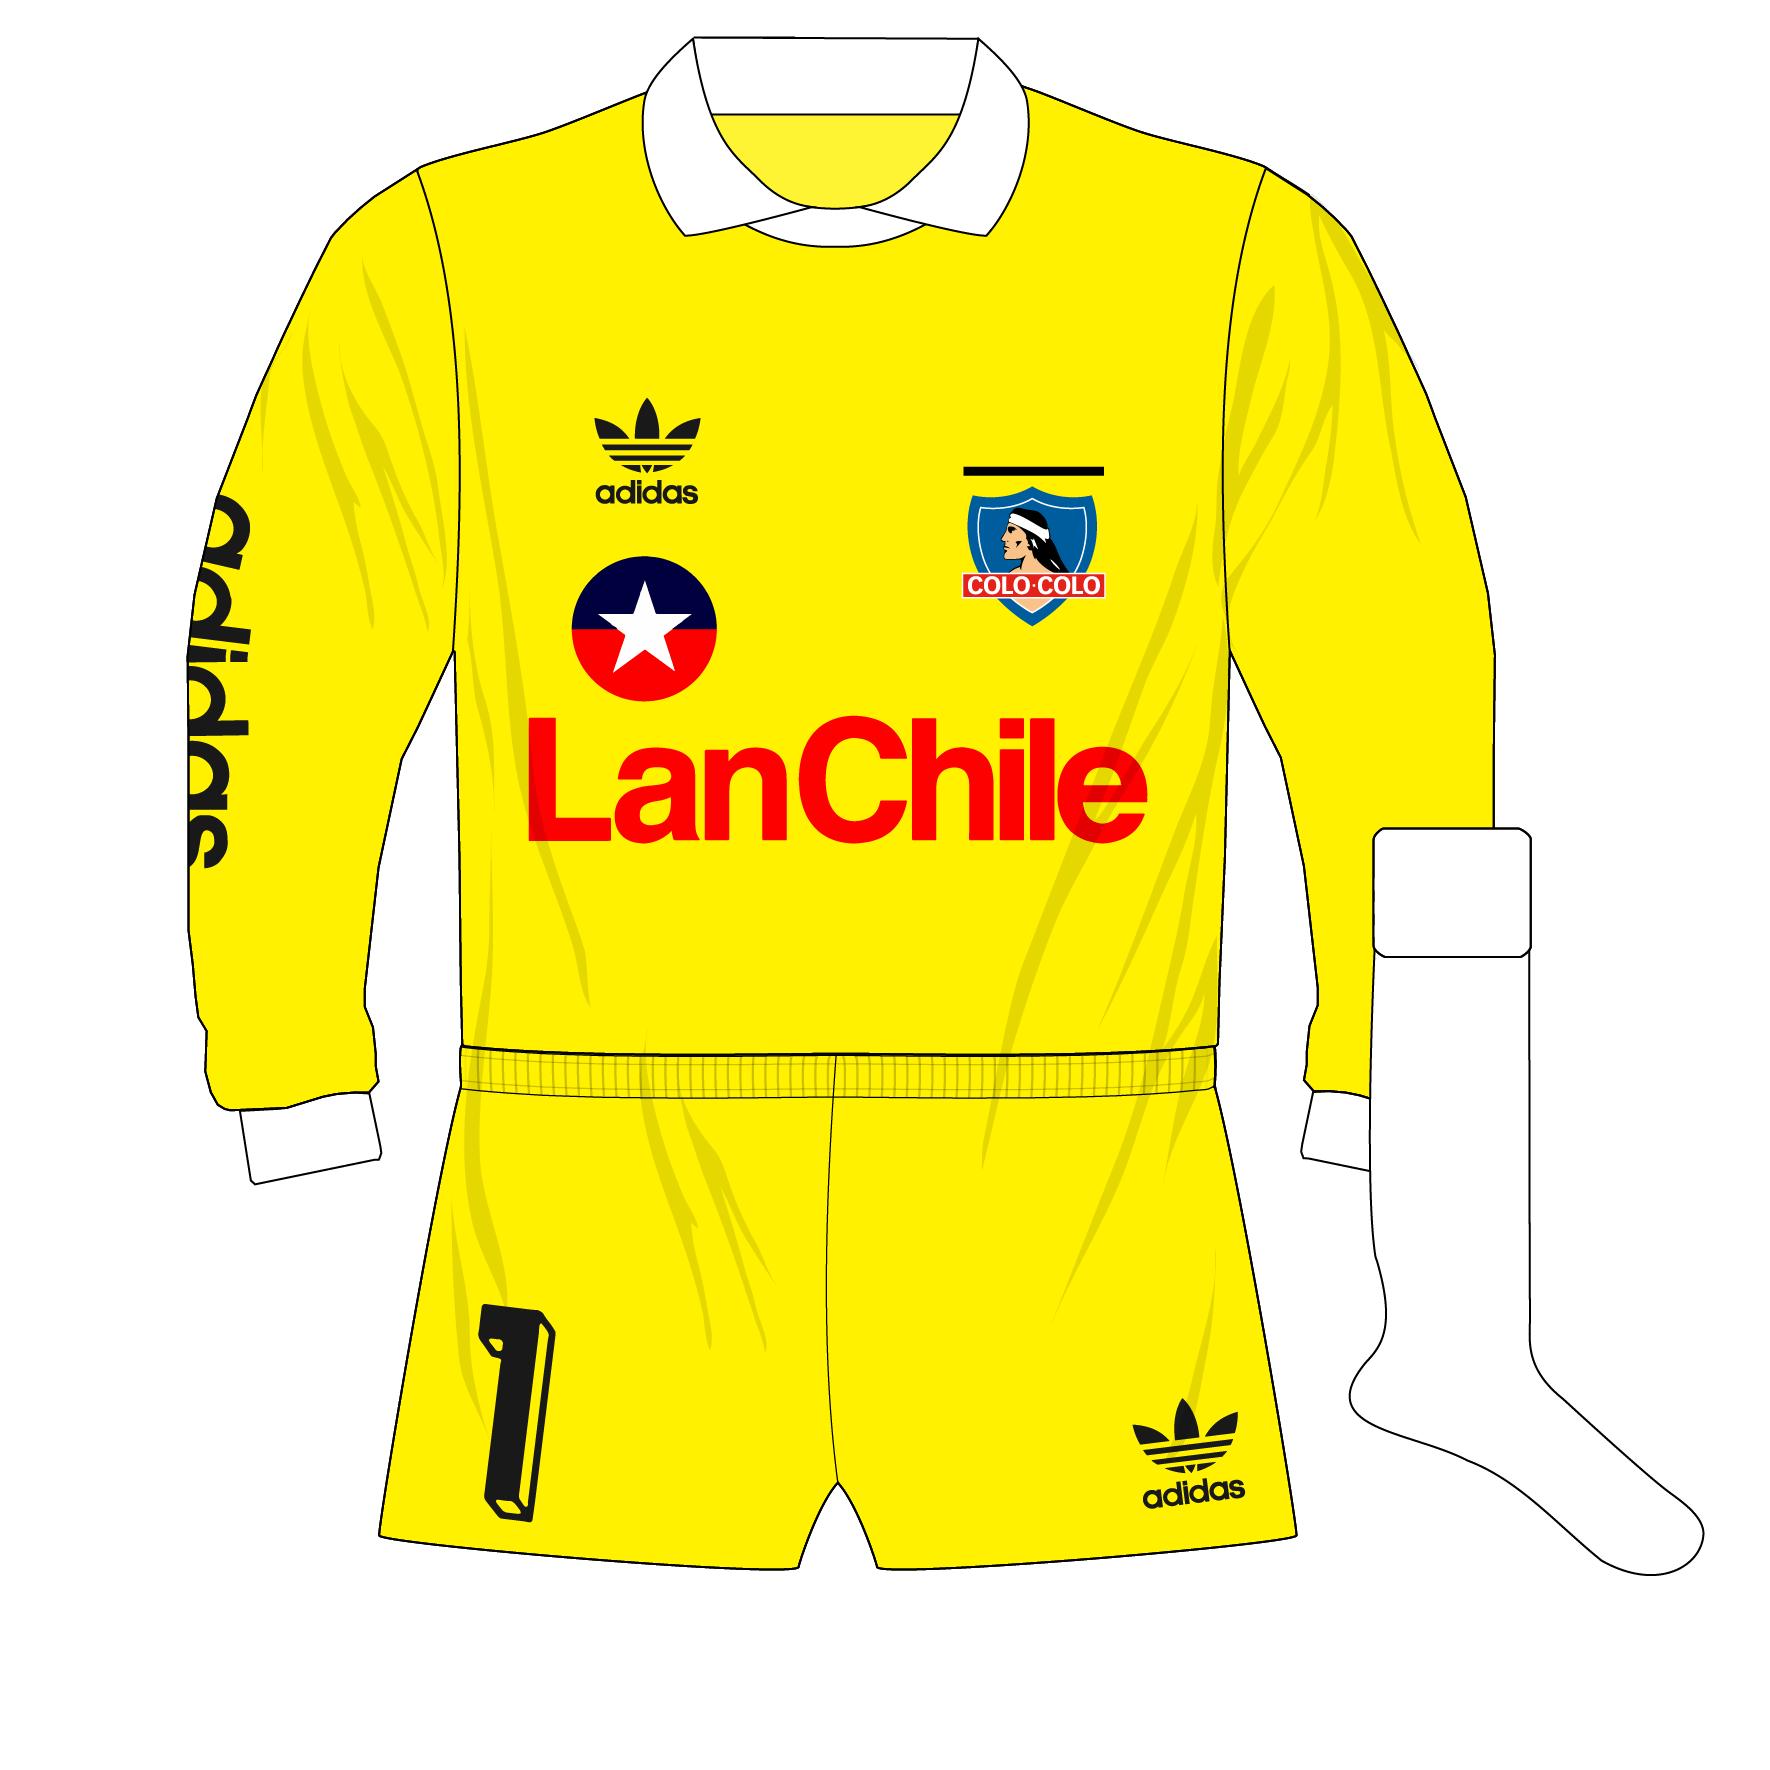 adidas-Colo-Colo-camiseta-portero-Daniel-Morón